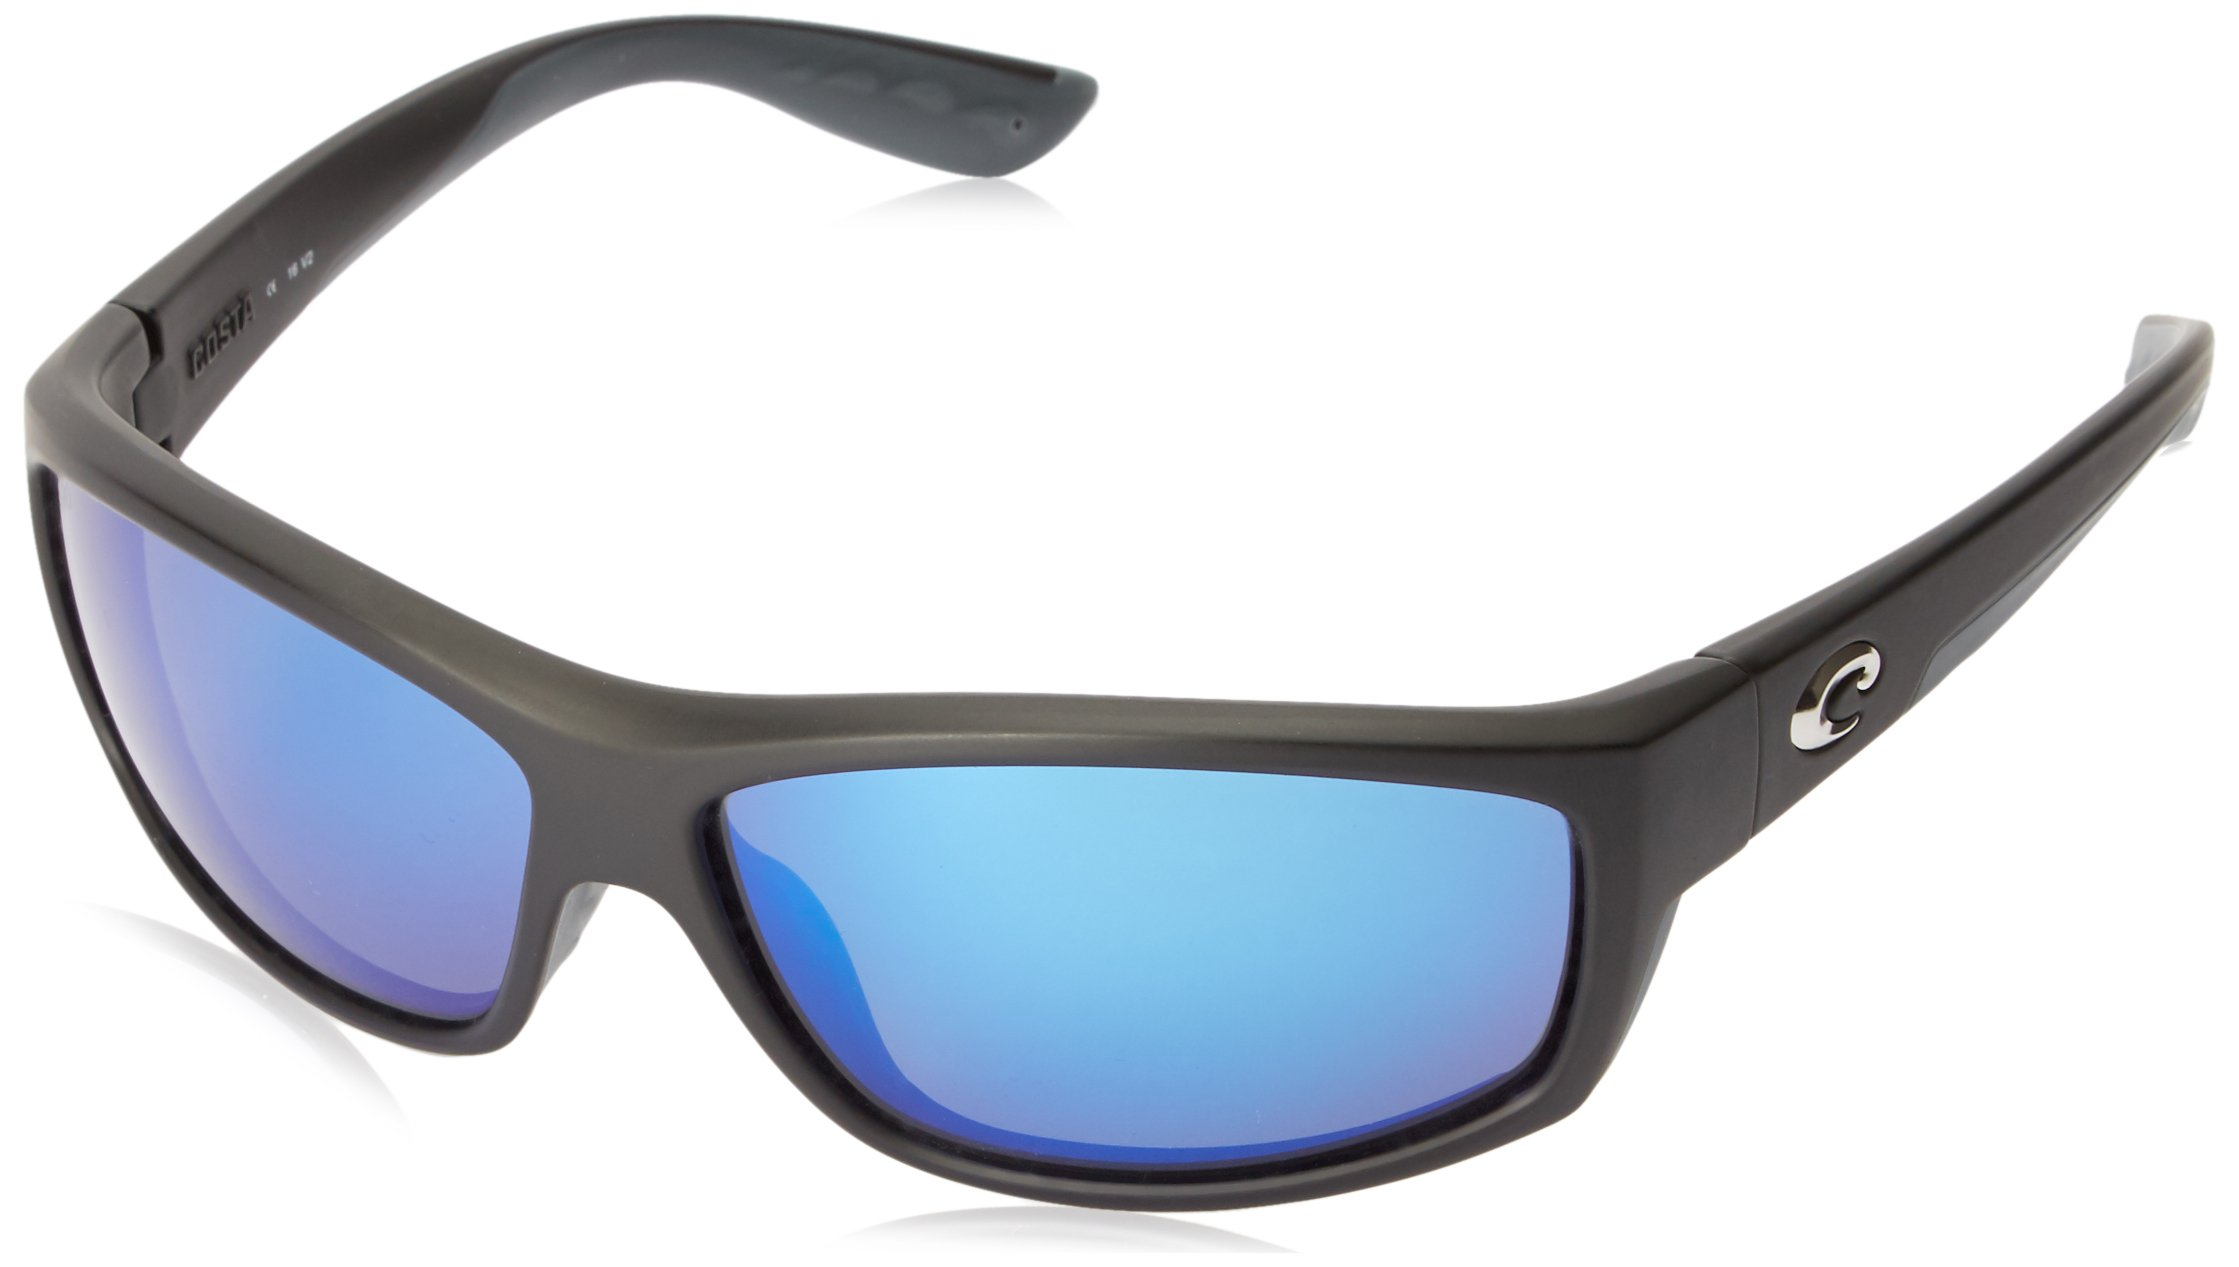 Costa del Mar Unisex-Adult Saltbreak BK 11 OBMGLP Polarized Iridium Wrap Sunglasses, Black, 64.5 mm